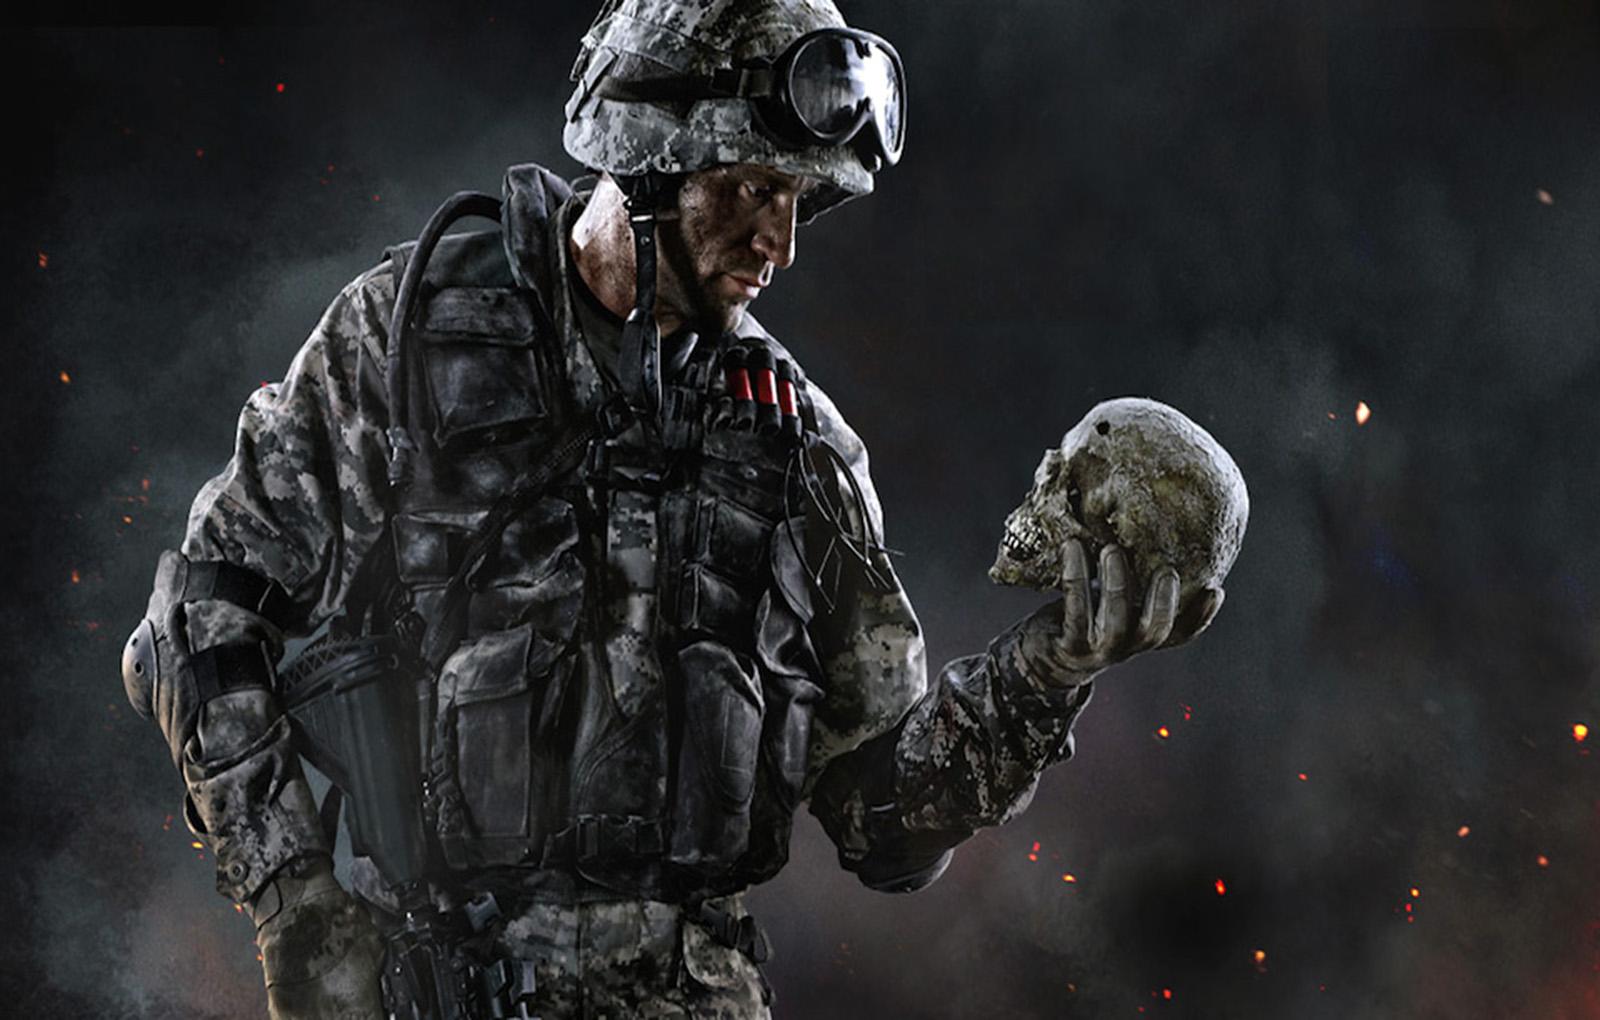 Source httpwwwdesktop imagecomgamepc gamer wallpaper 7 1600x1020